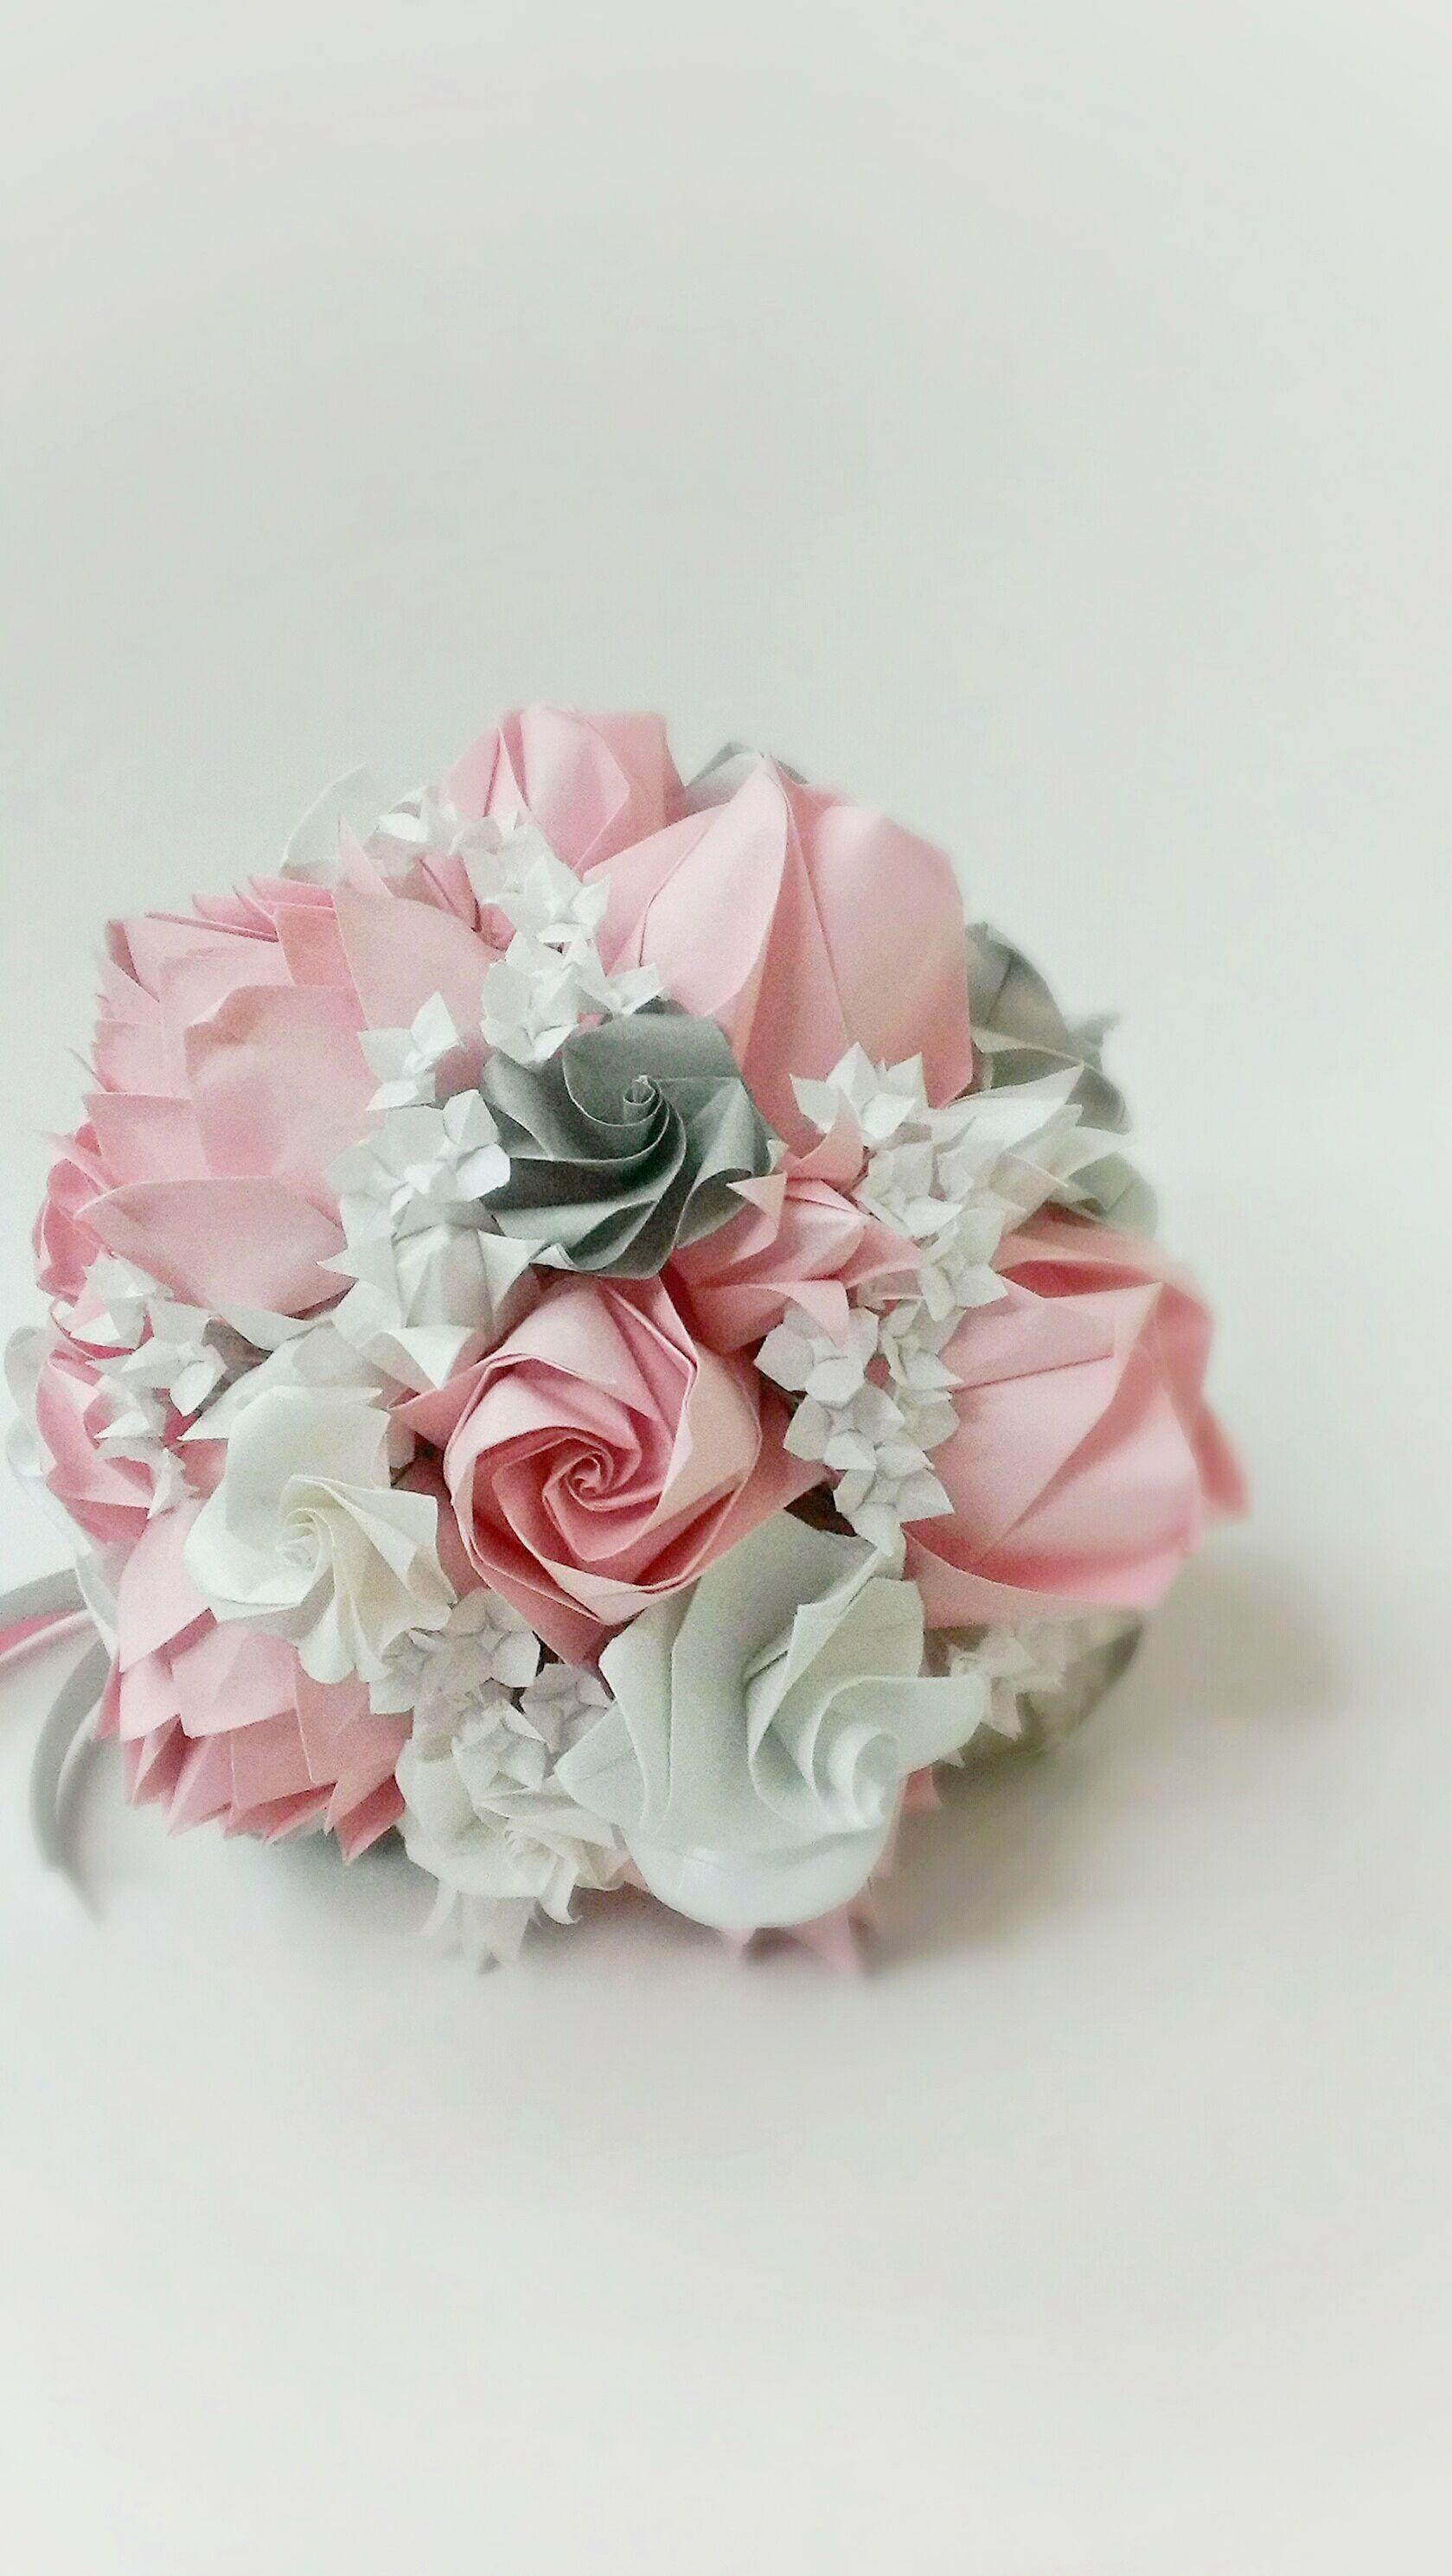 Fourre-tout Escamotée - Bouquet Par Vida Vida bSYNNmU49R